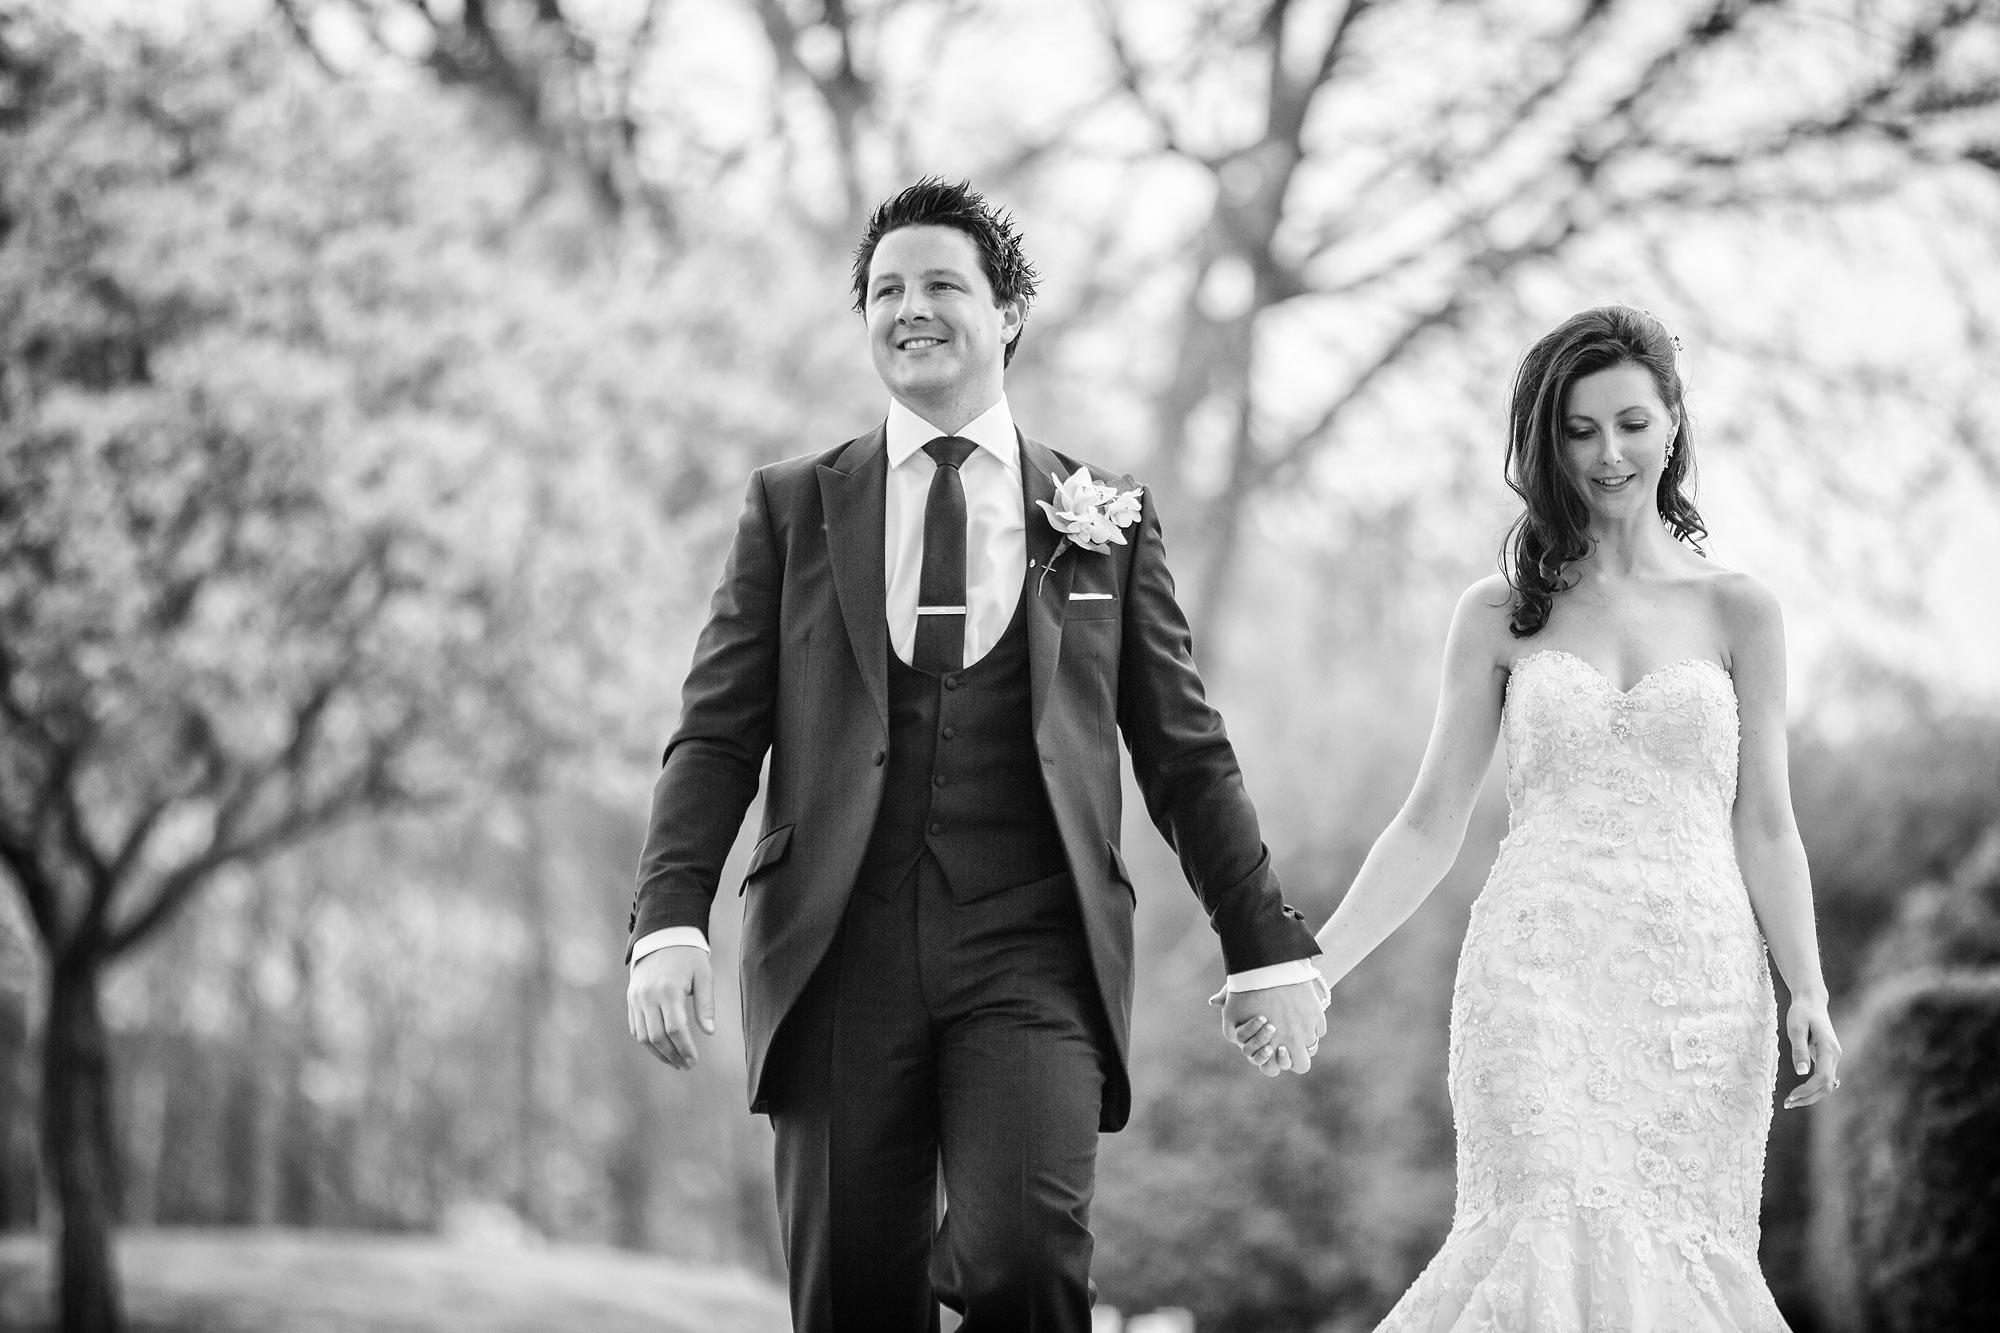 Stock Brook Country Club Wedding photo ideas